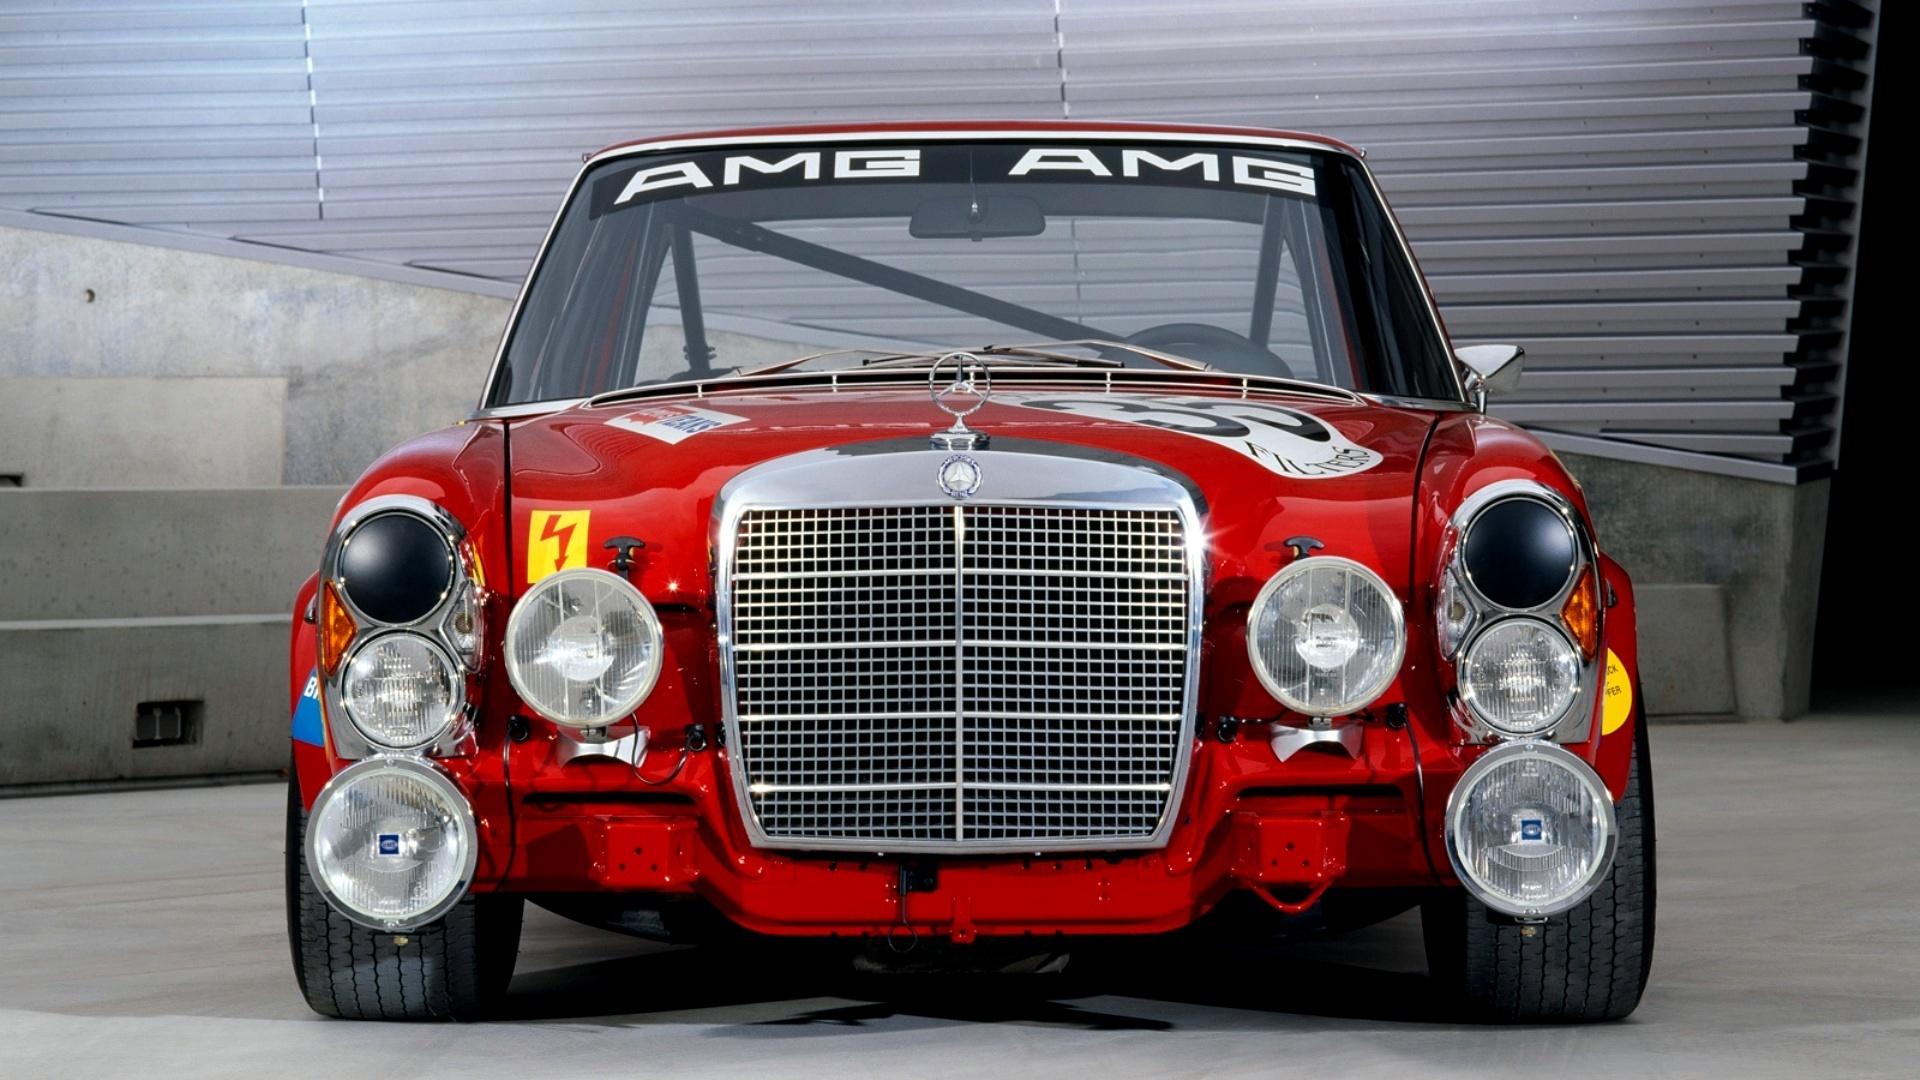 Mercedes HD Wallpaper | Background Image | 1920x1080 | ID ...